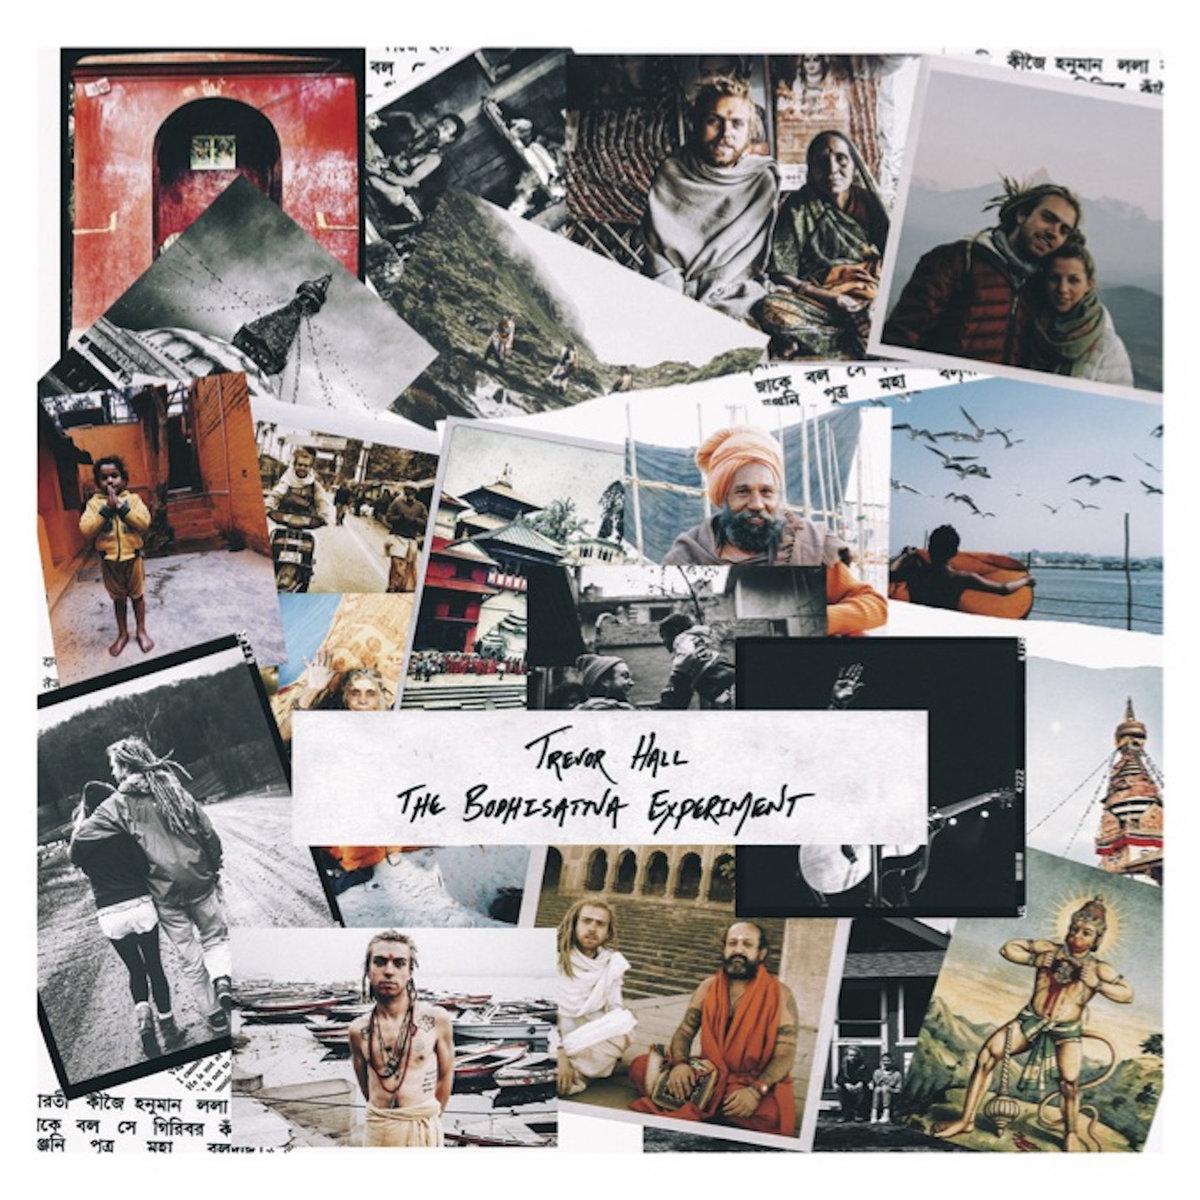 Listen Now: Trevor Hall - Bharat